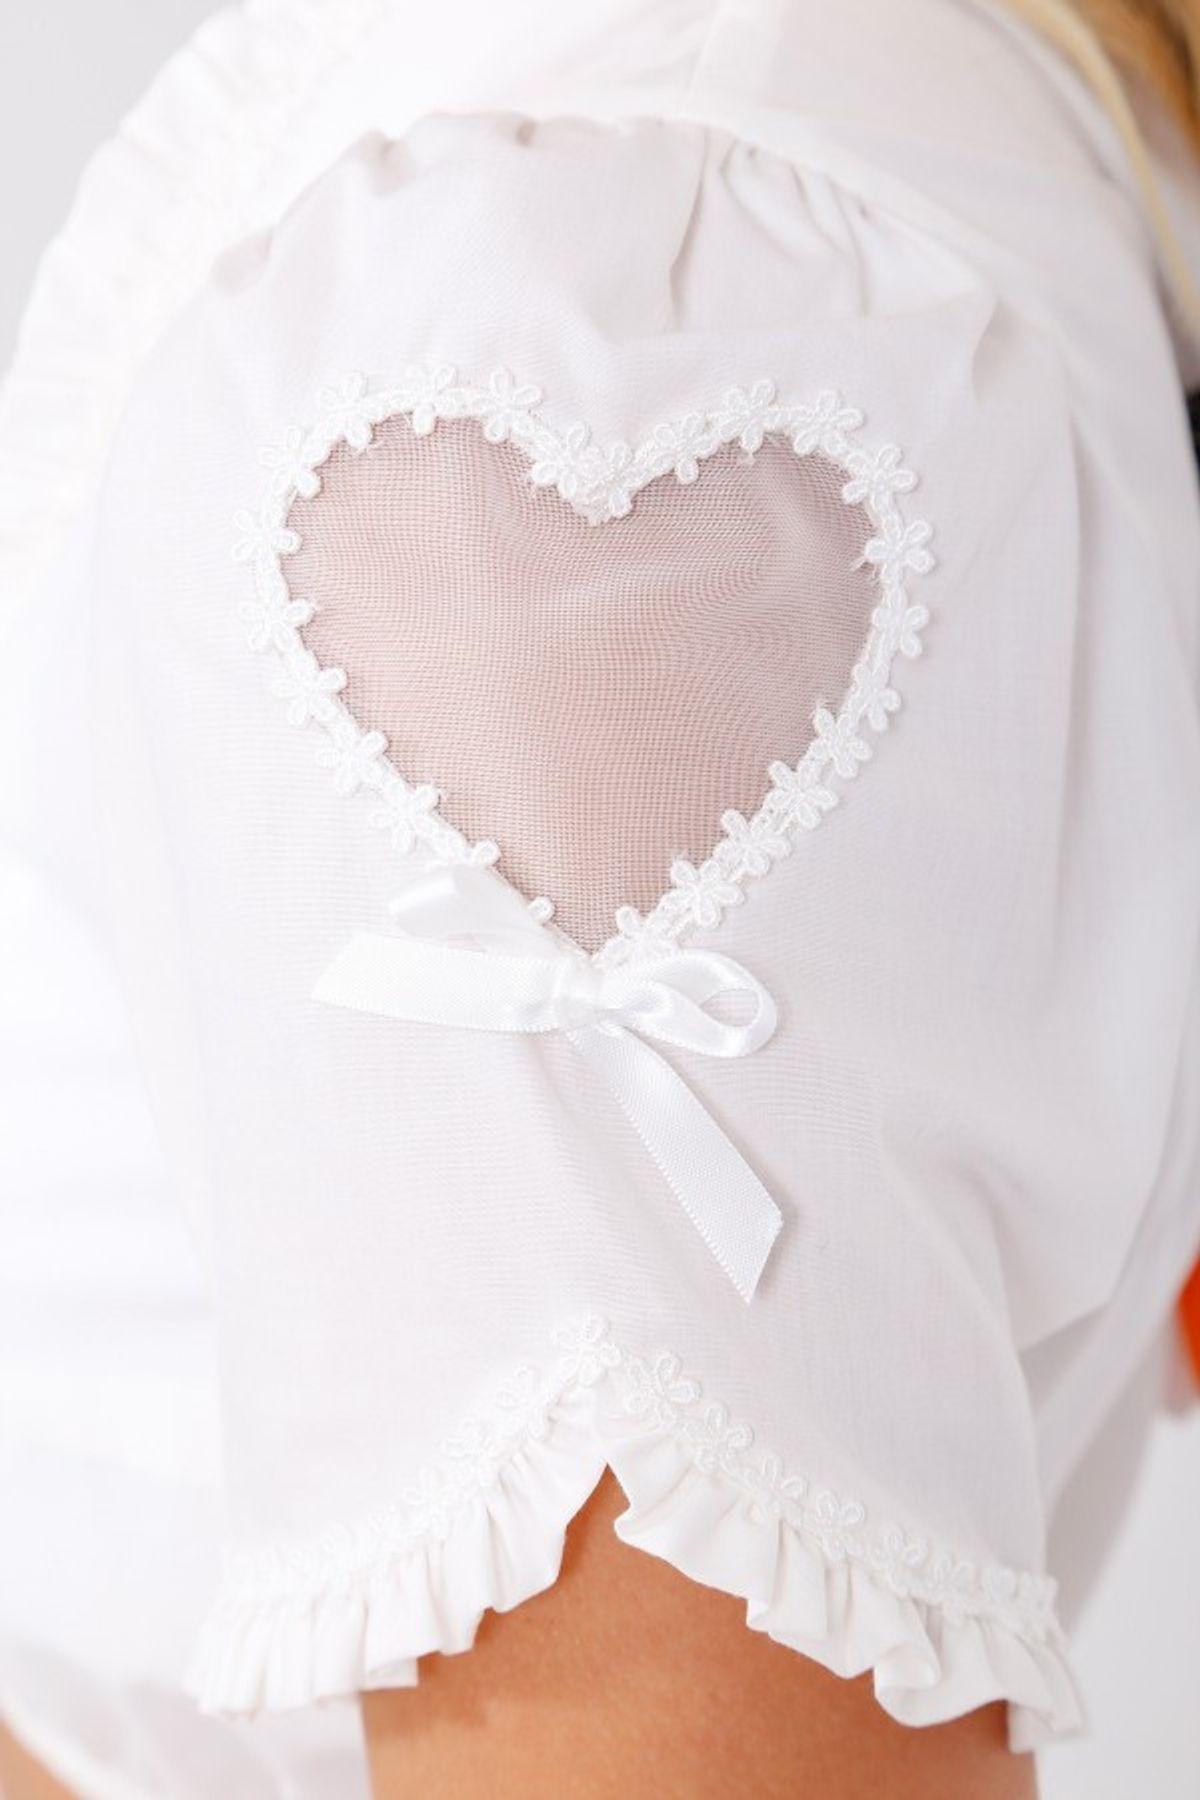 Krüger - Damen Dirndlbluse in ecru, Pretty Heart (32140-2) – Bild 5